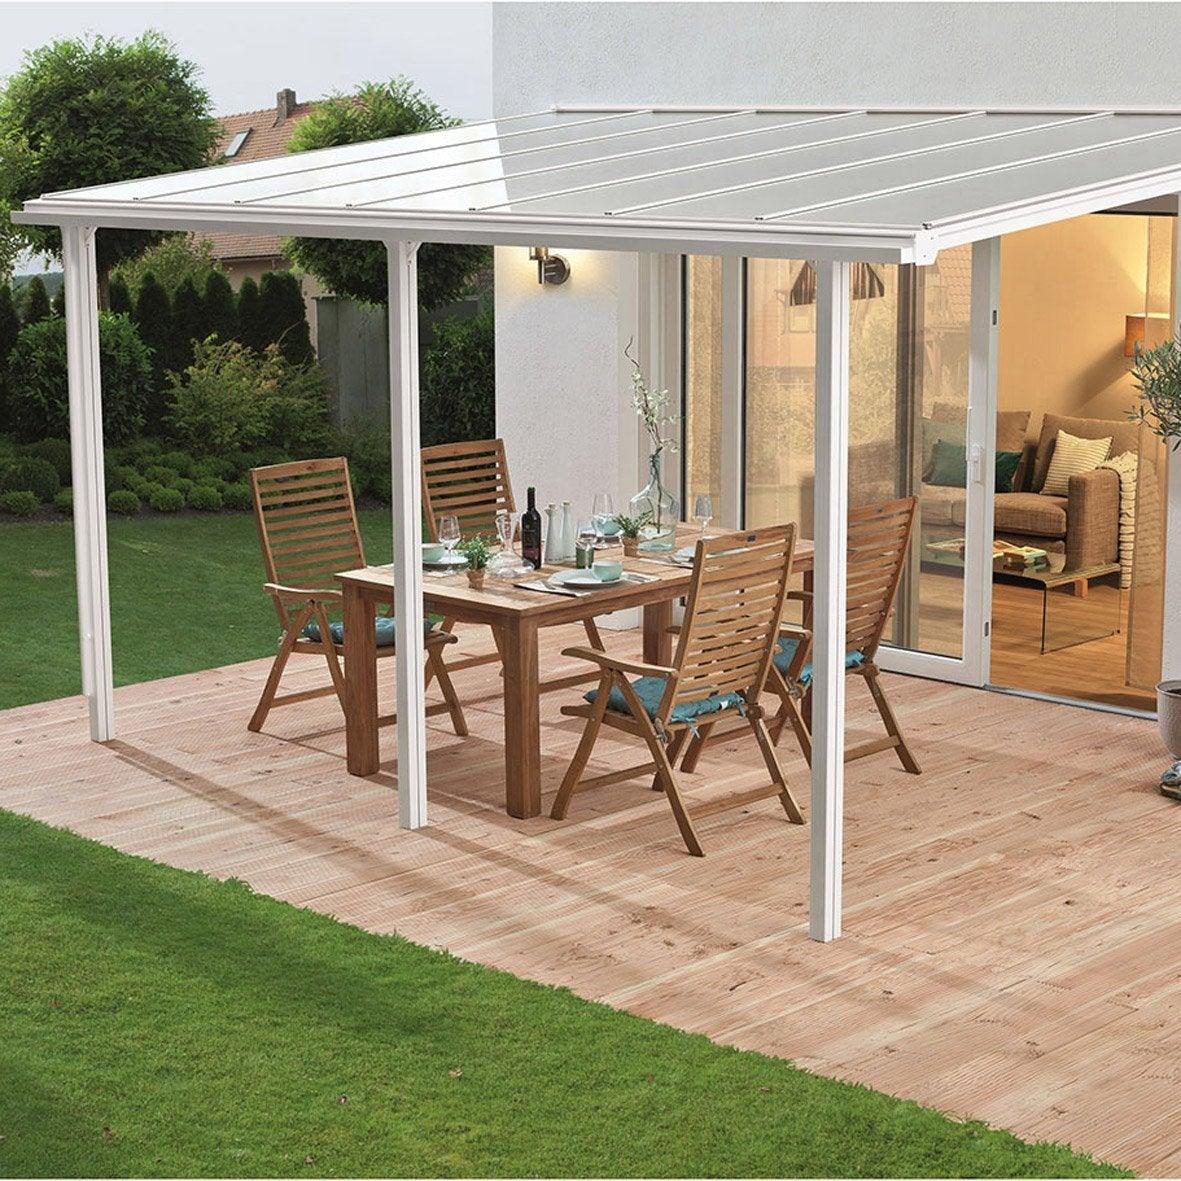 couverture de terrasse adoss e tradition aluminium blanche m leroy merlin. Black Bedroom Furniture Sets. Home Design Ideas